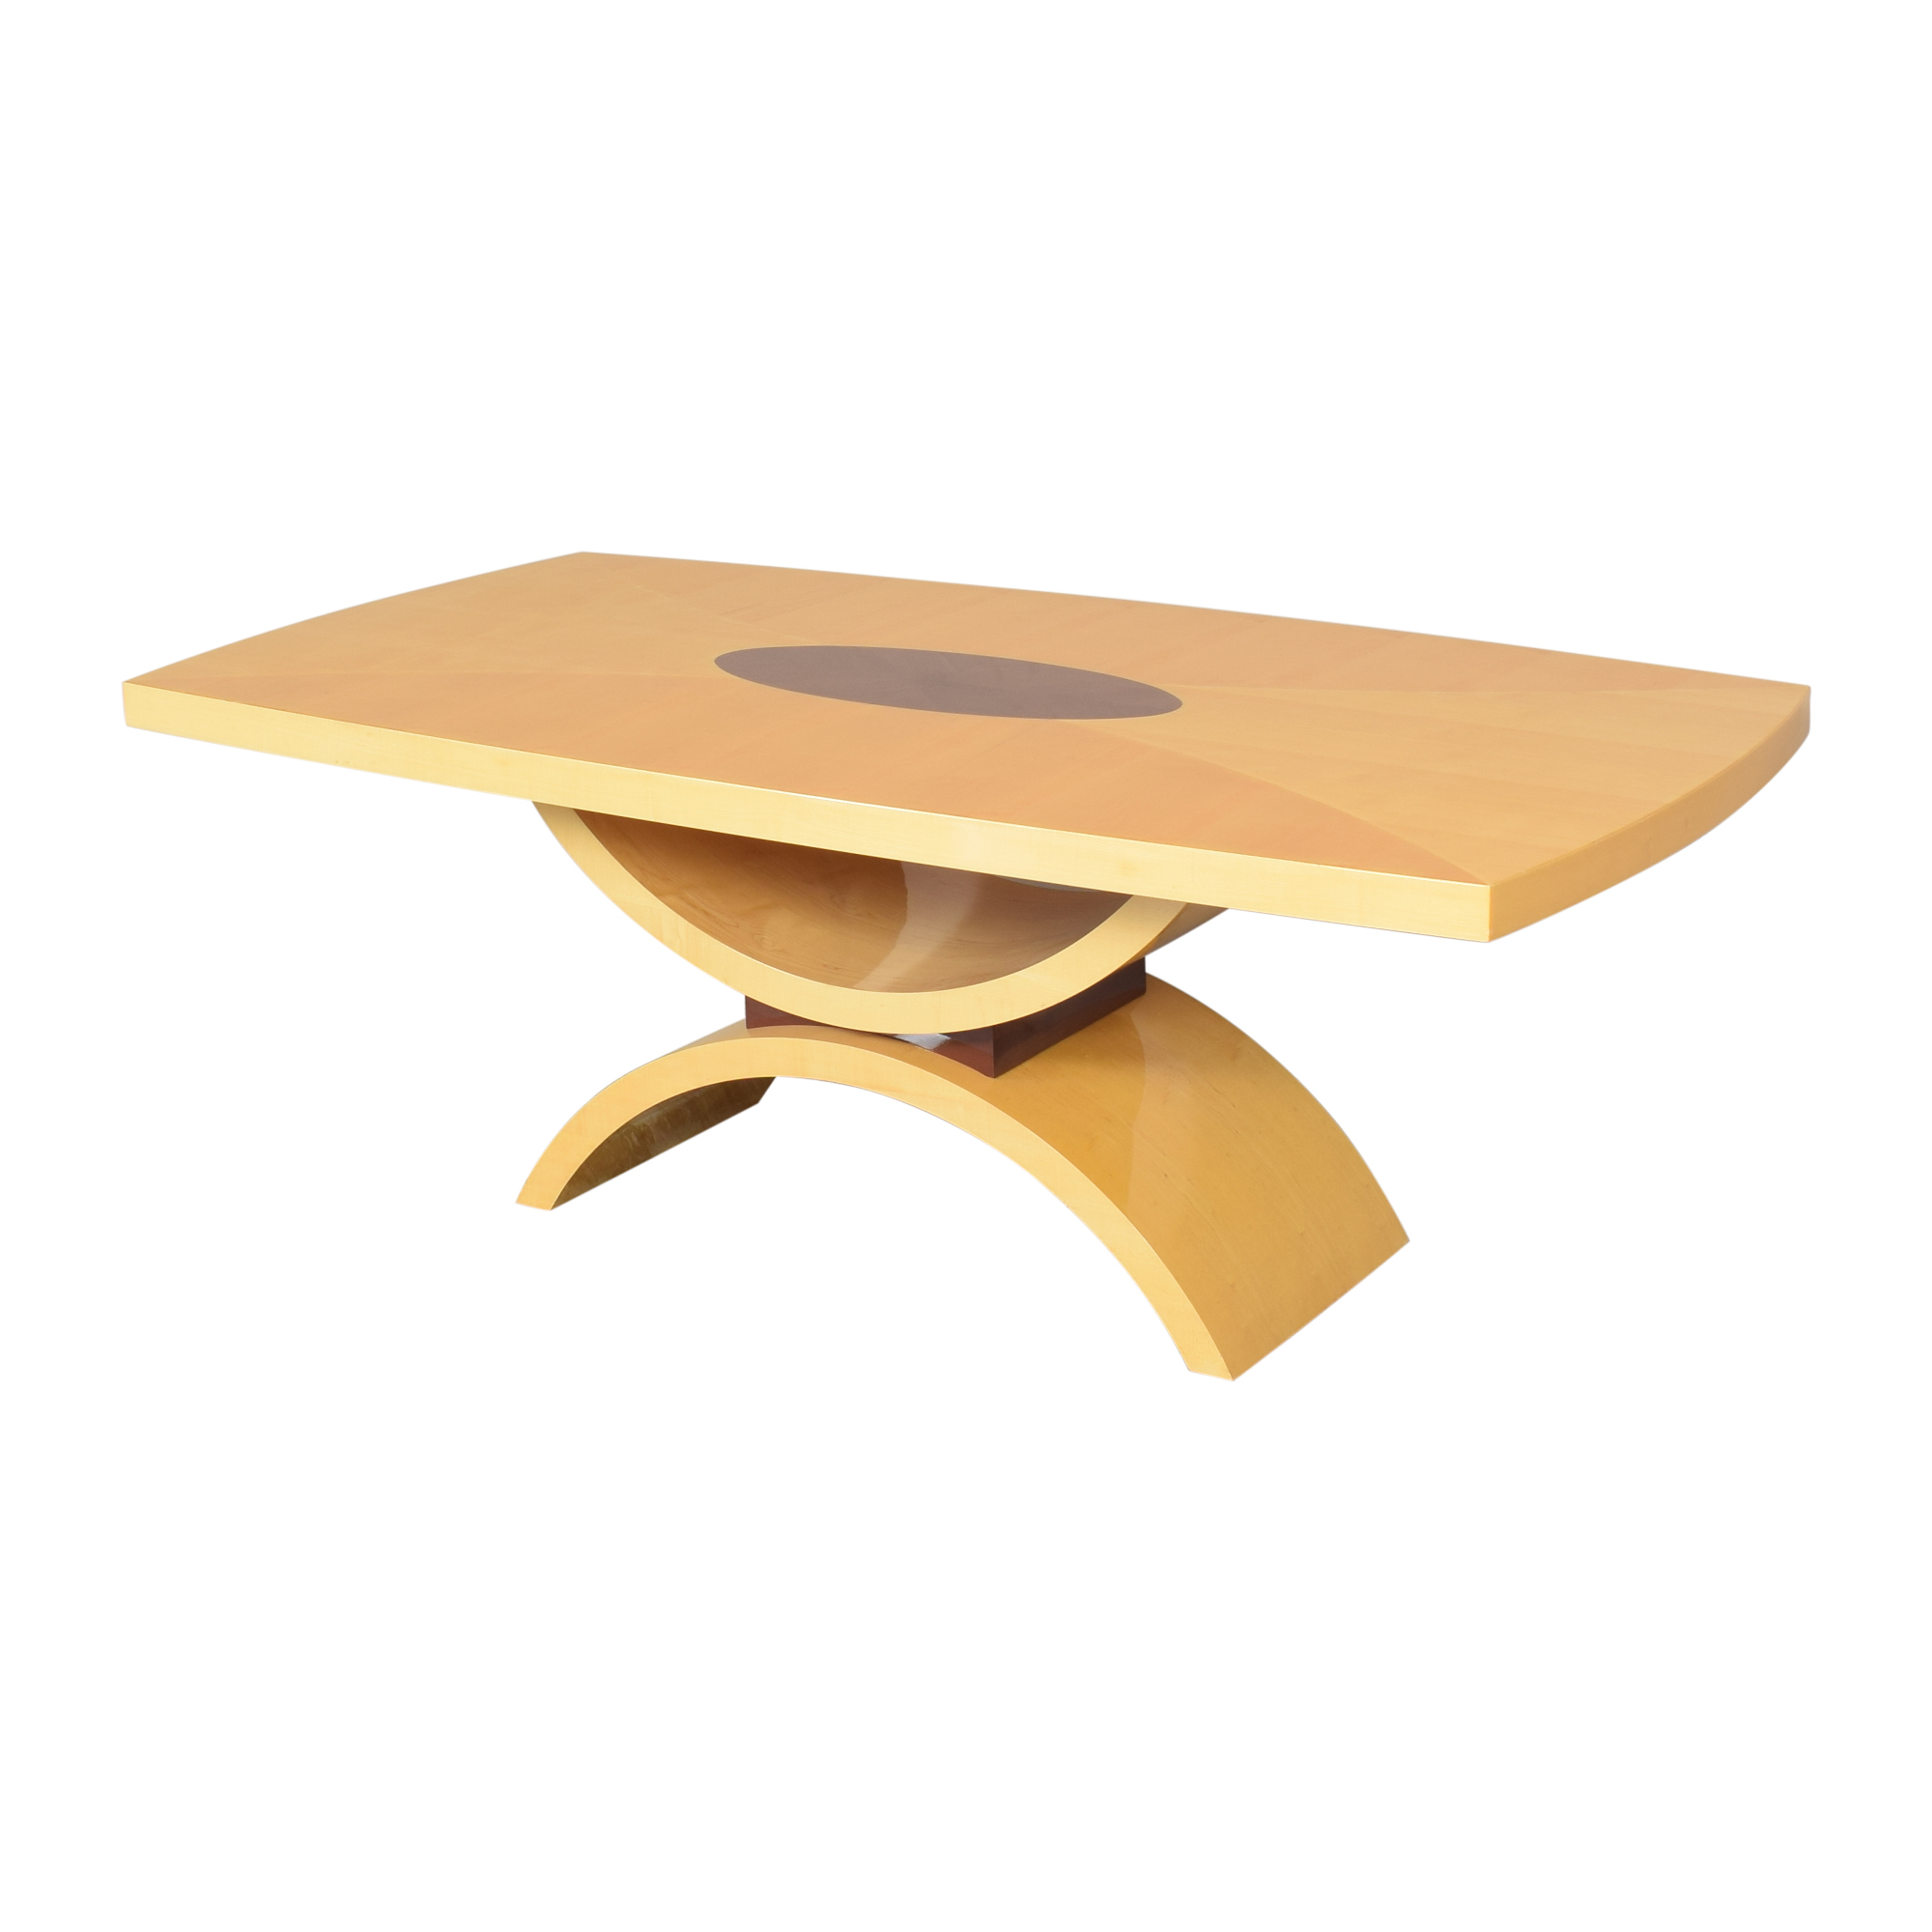 Pietro Costantini Pietro Costantini Extendable Dining Table nyc